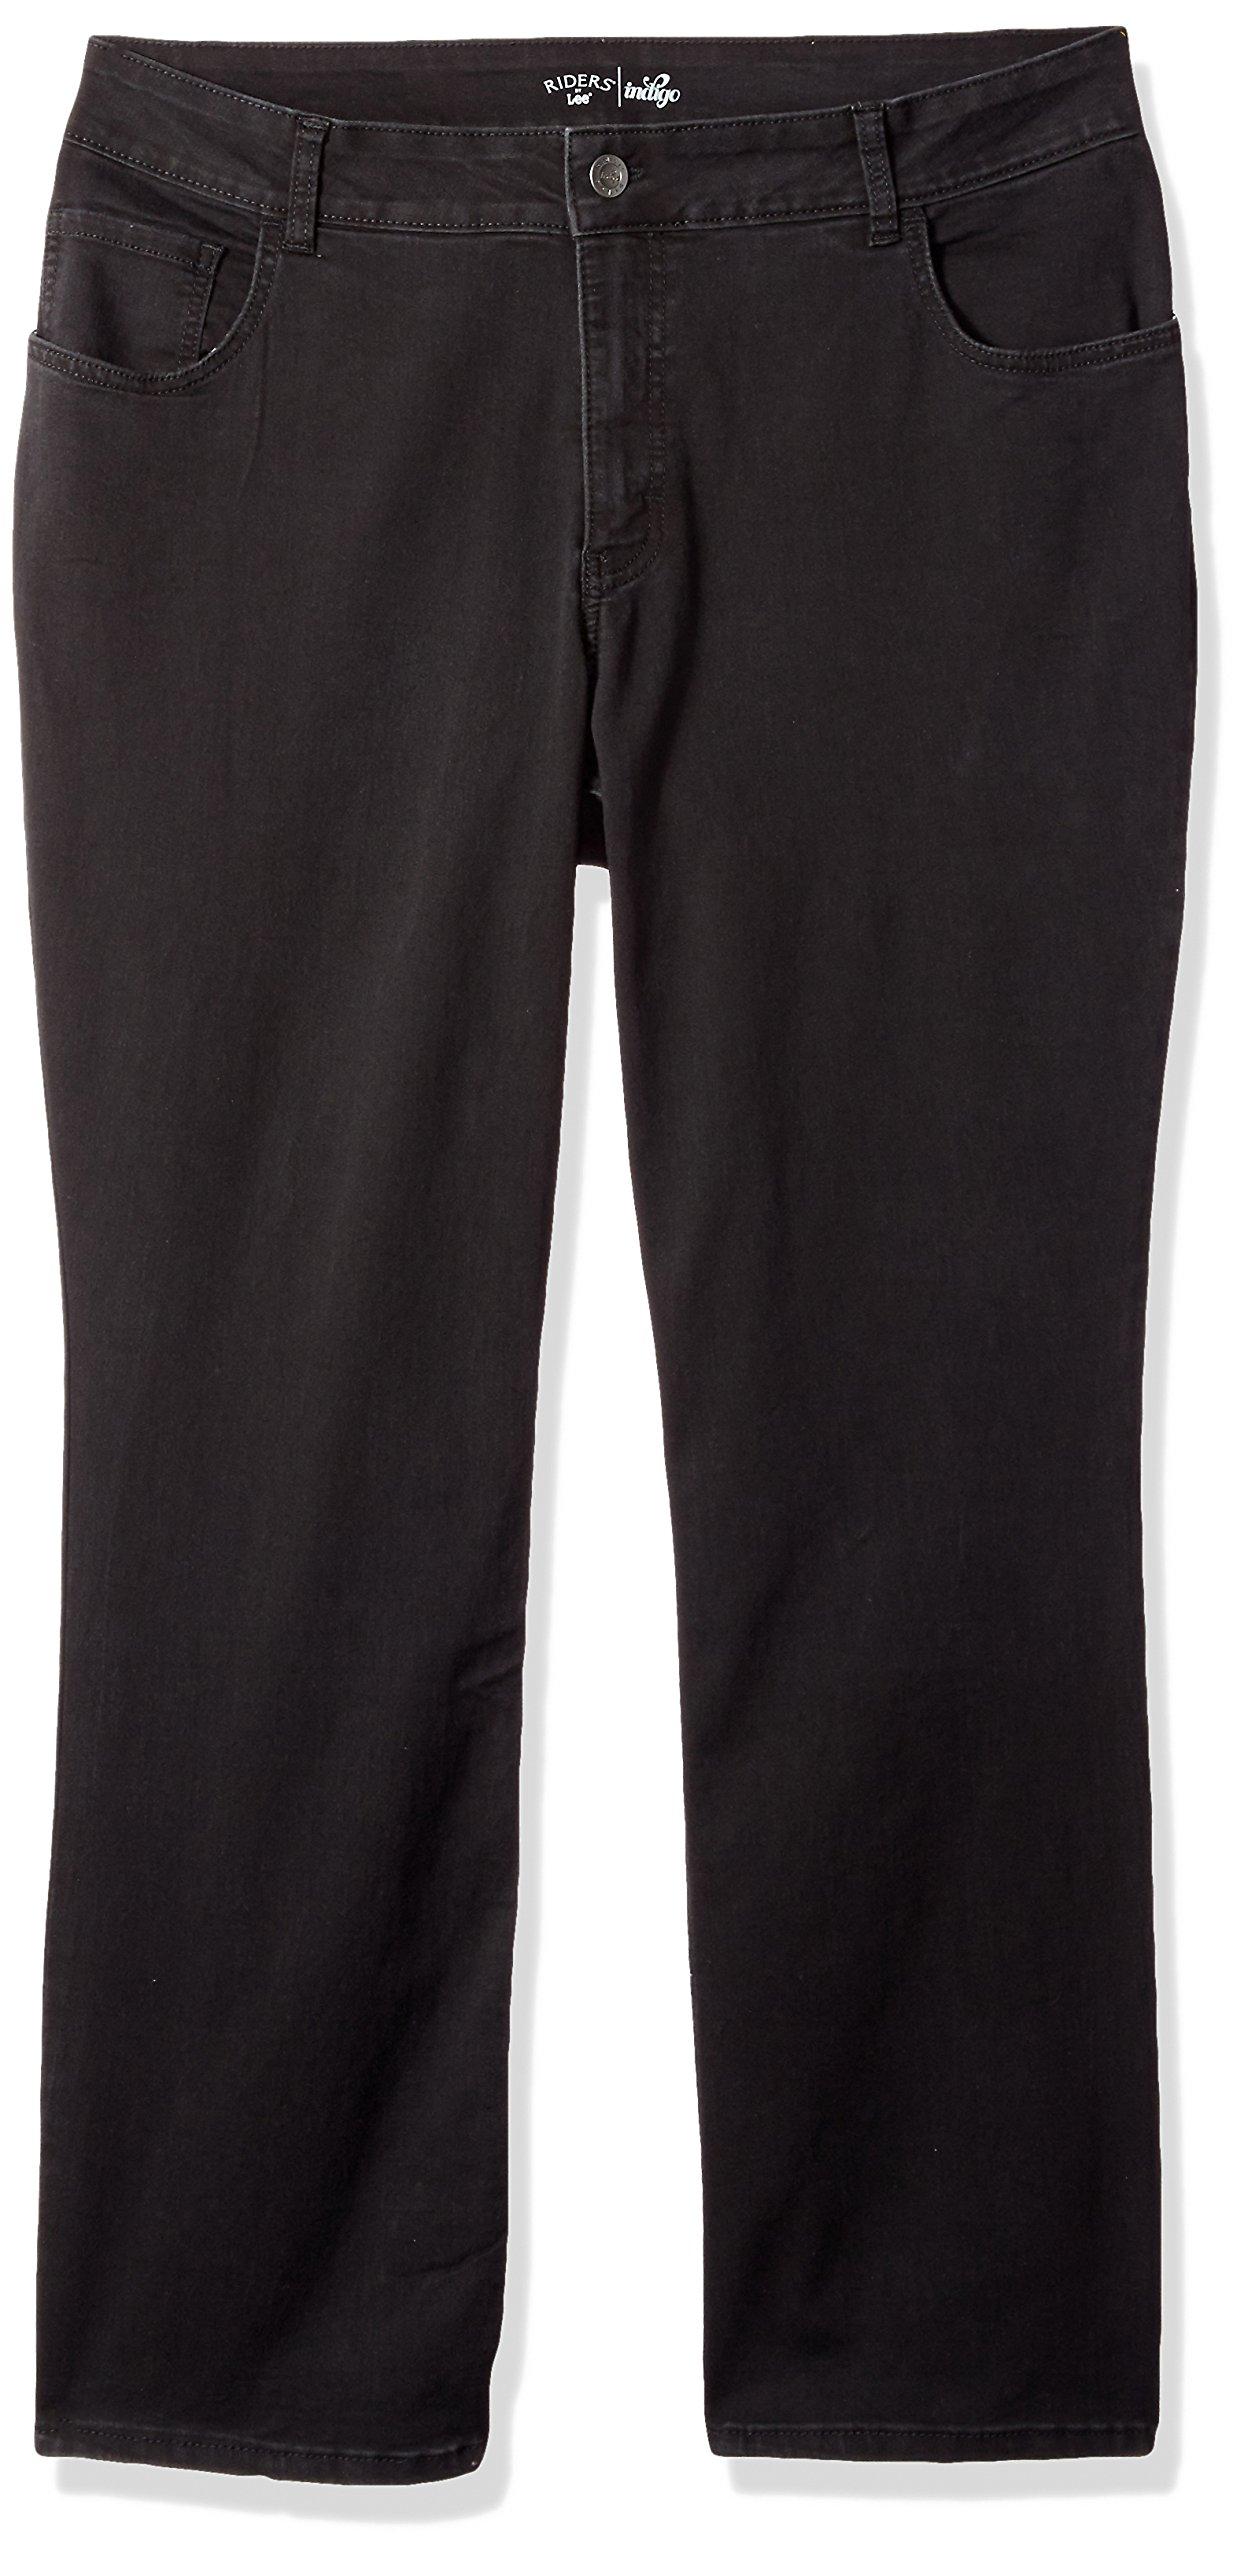 Riders by Lee Indigo Women's Plus Size Stretch Fit No Gap Boot Cut Jean, Soft Black, 22W